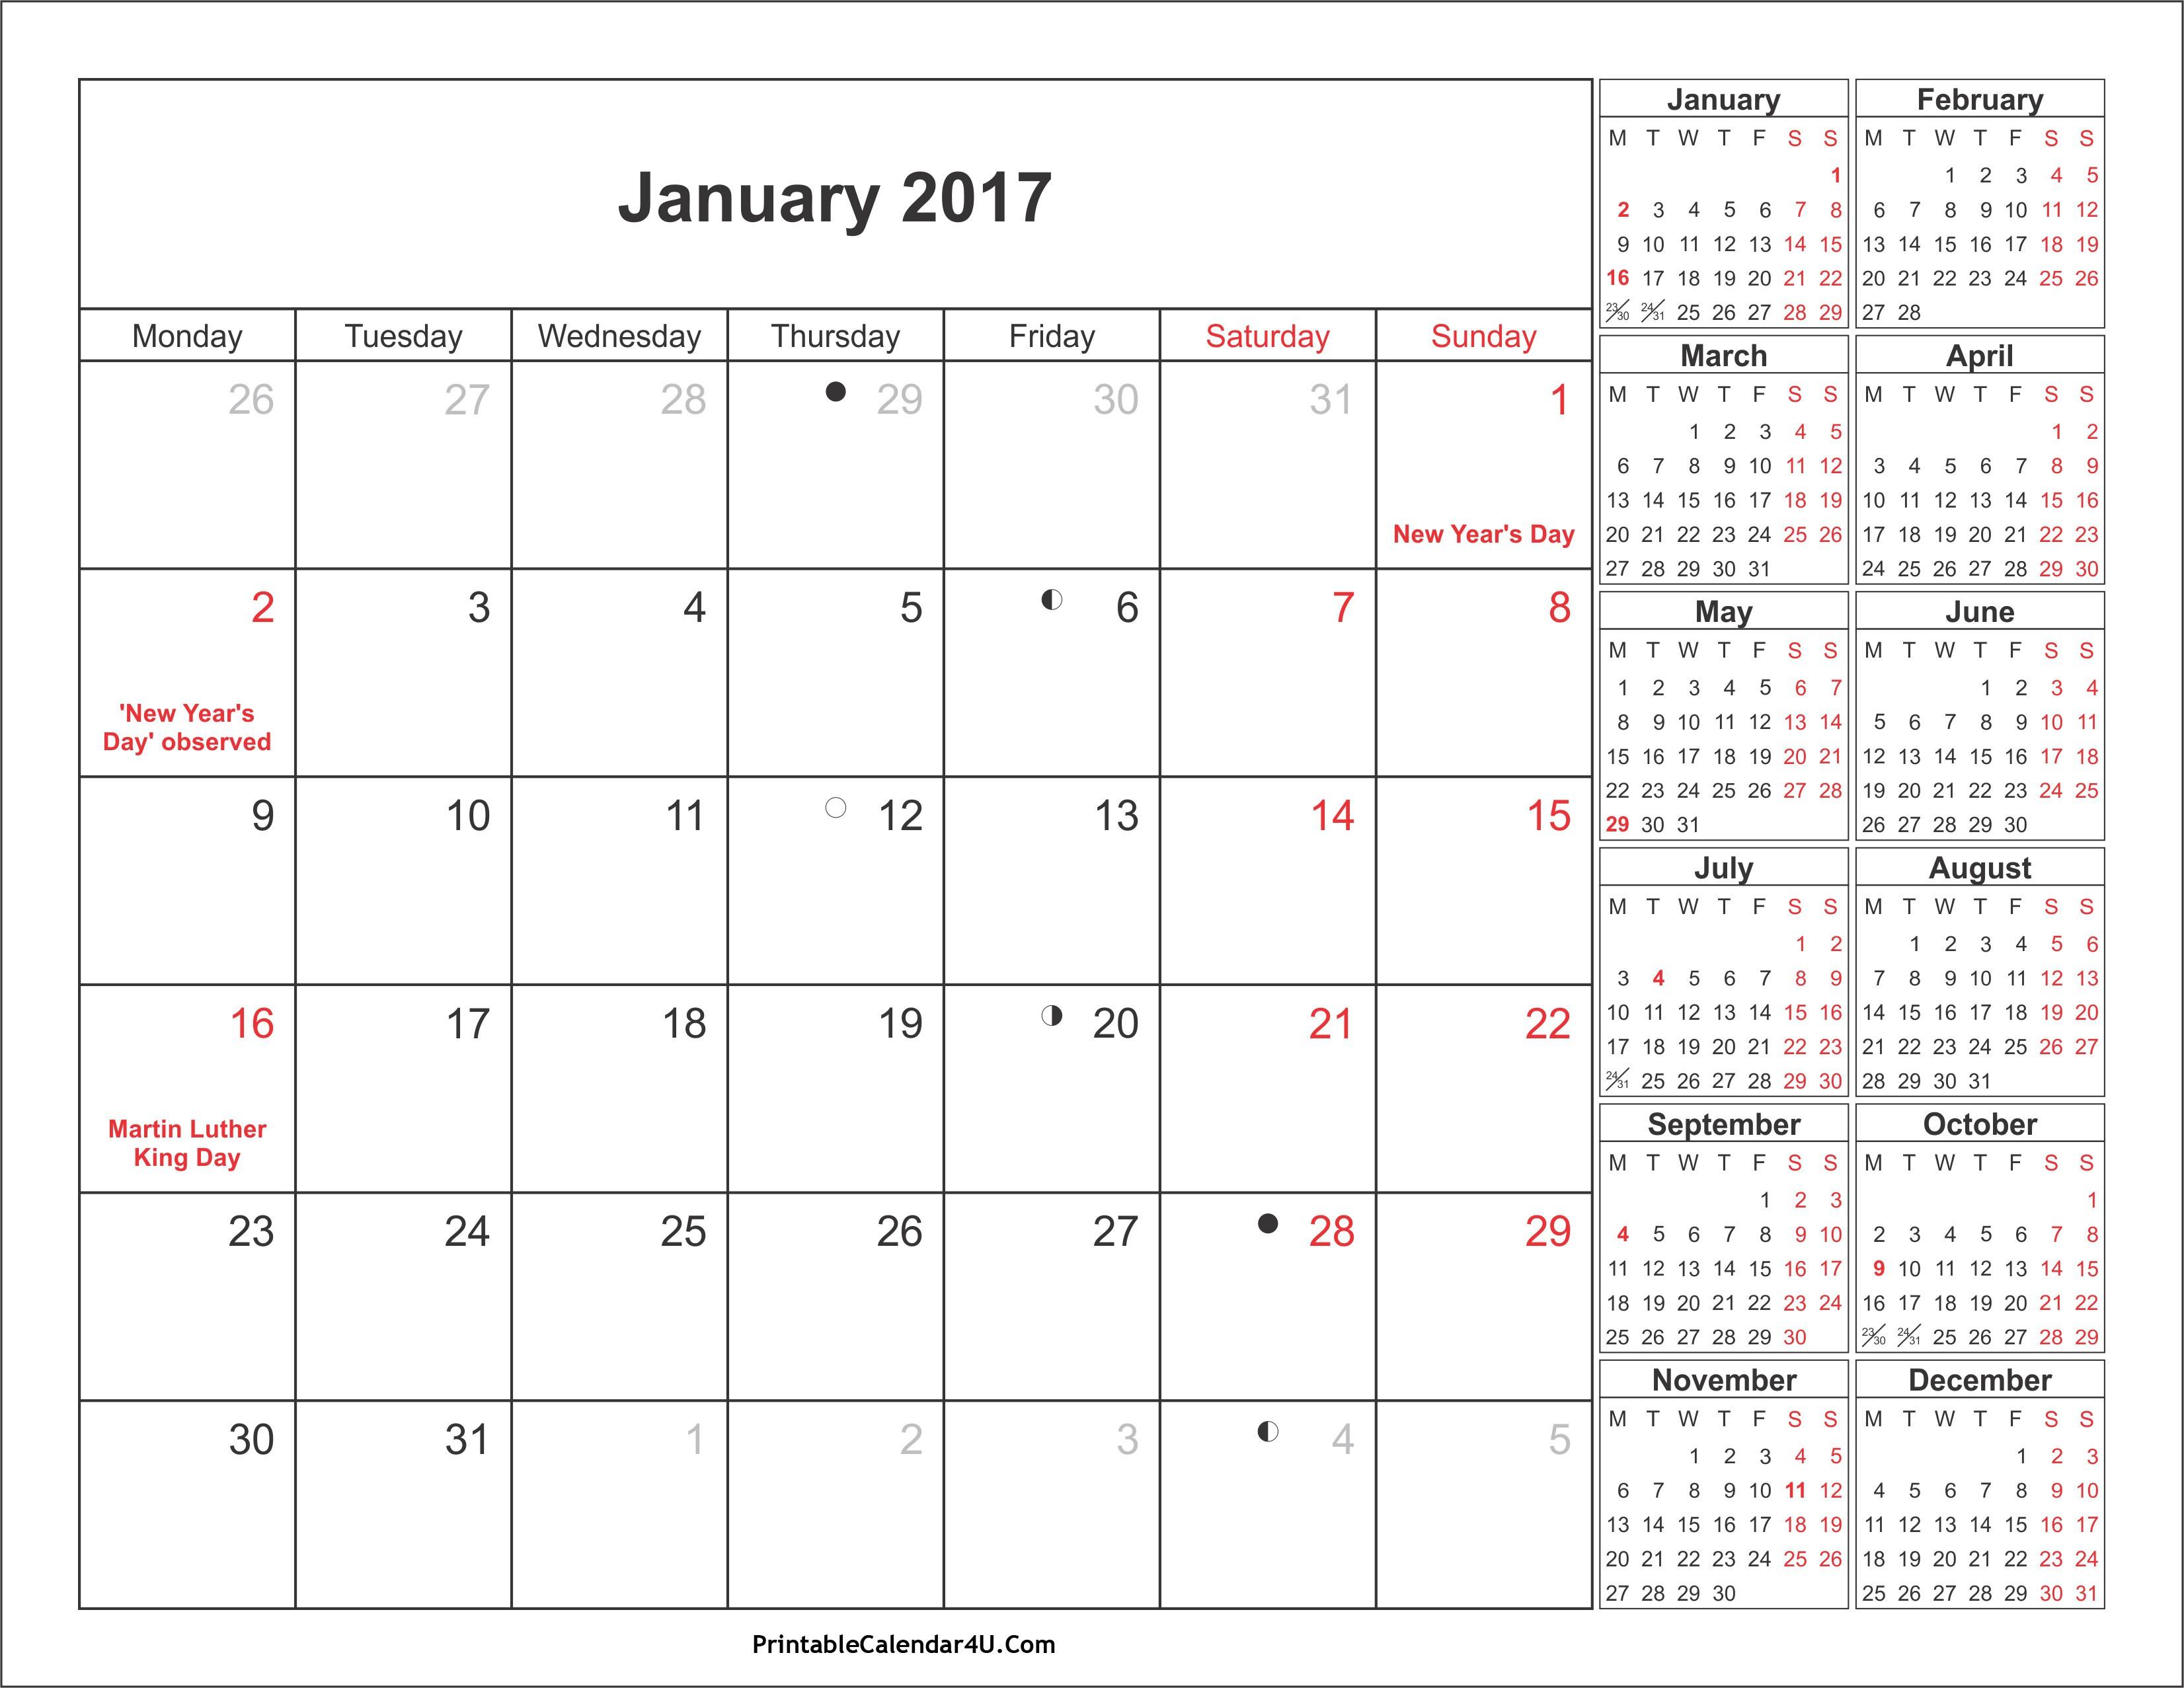 2019 Calendar Philippines Excel Más Caliente 2017 and 2018 Calendar with Holidays September 2019 Calendar with Of 2019 Calendar Philippines Excel Más Actual Angelsapna 93angelsapna On Pinterest